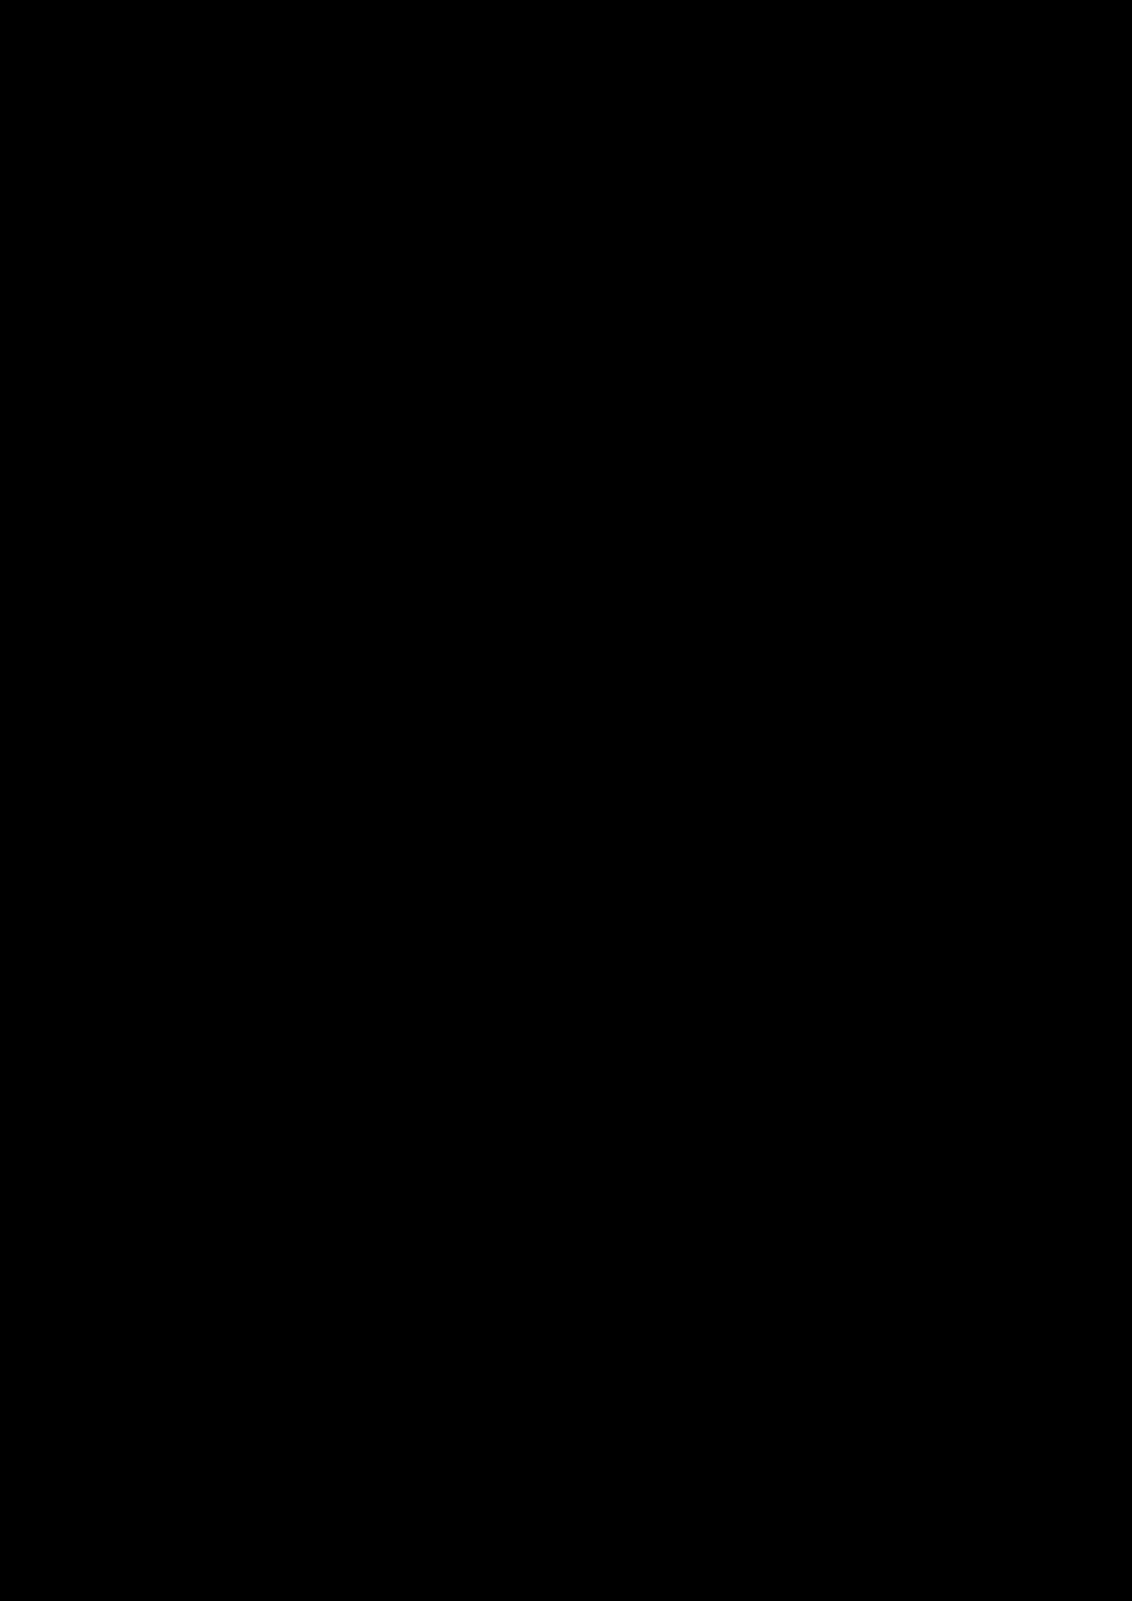 Belyiy sokol slide, Image 188